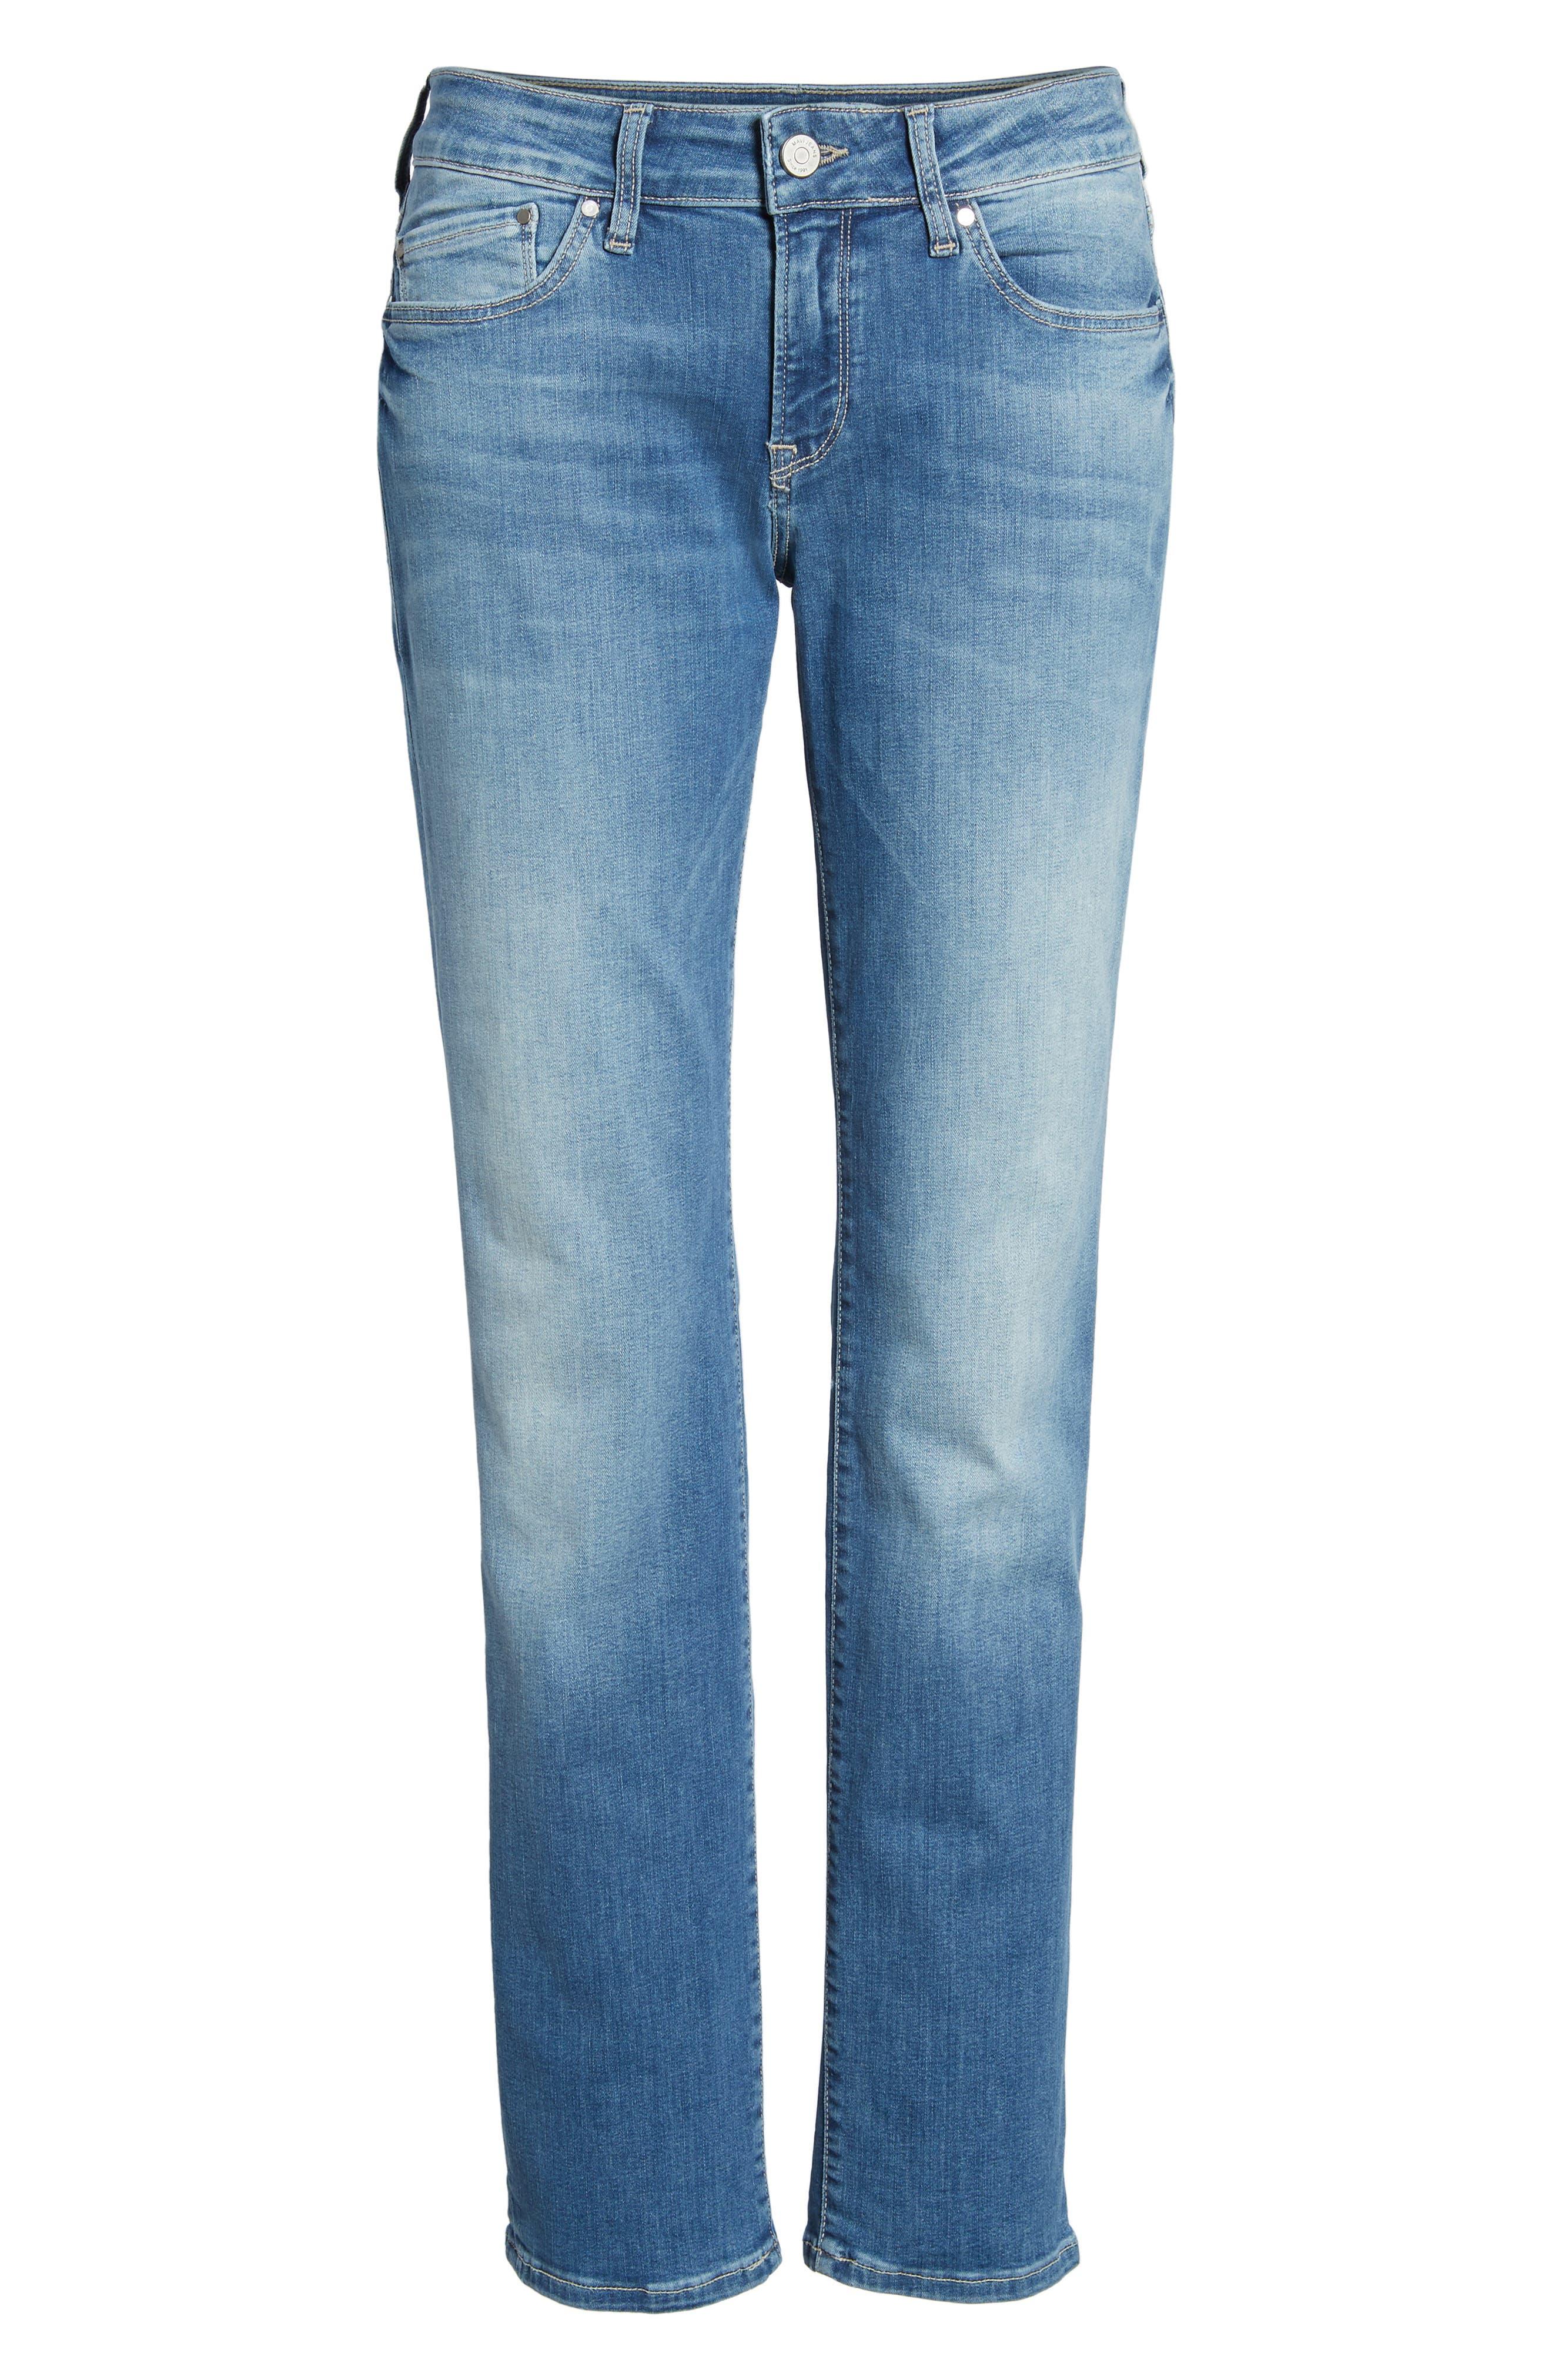 Emma Slim Boyfriend Jeans,                             Alternate thumbnail 7, color,                             INDIGO RIPPED NOLITA